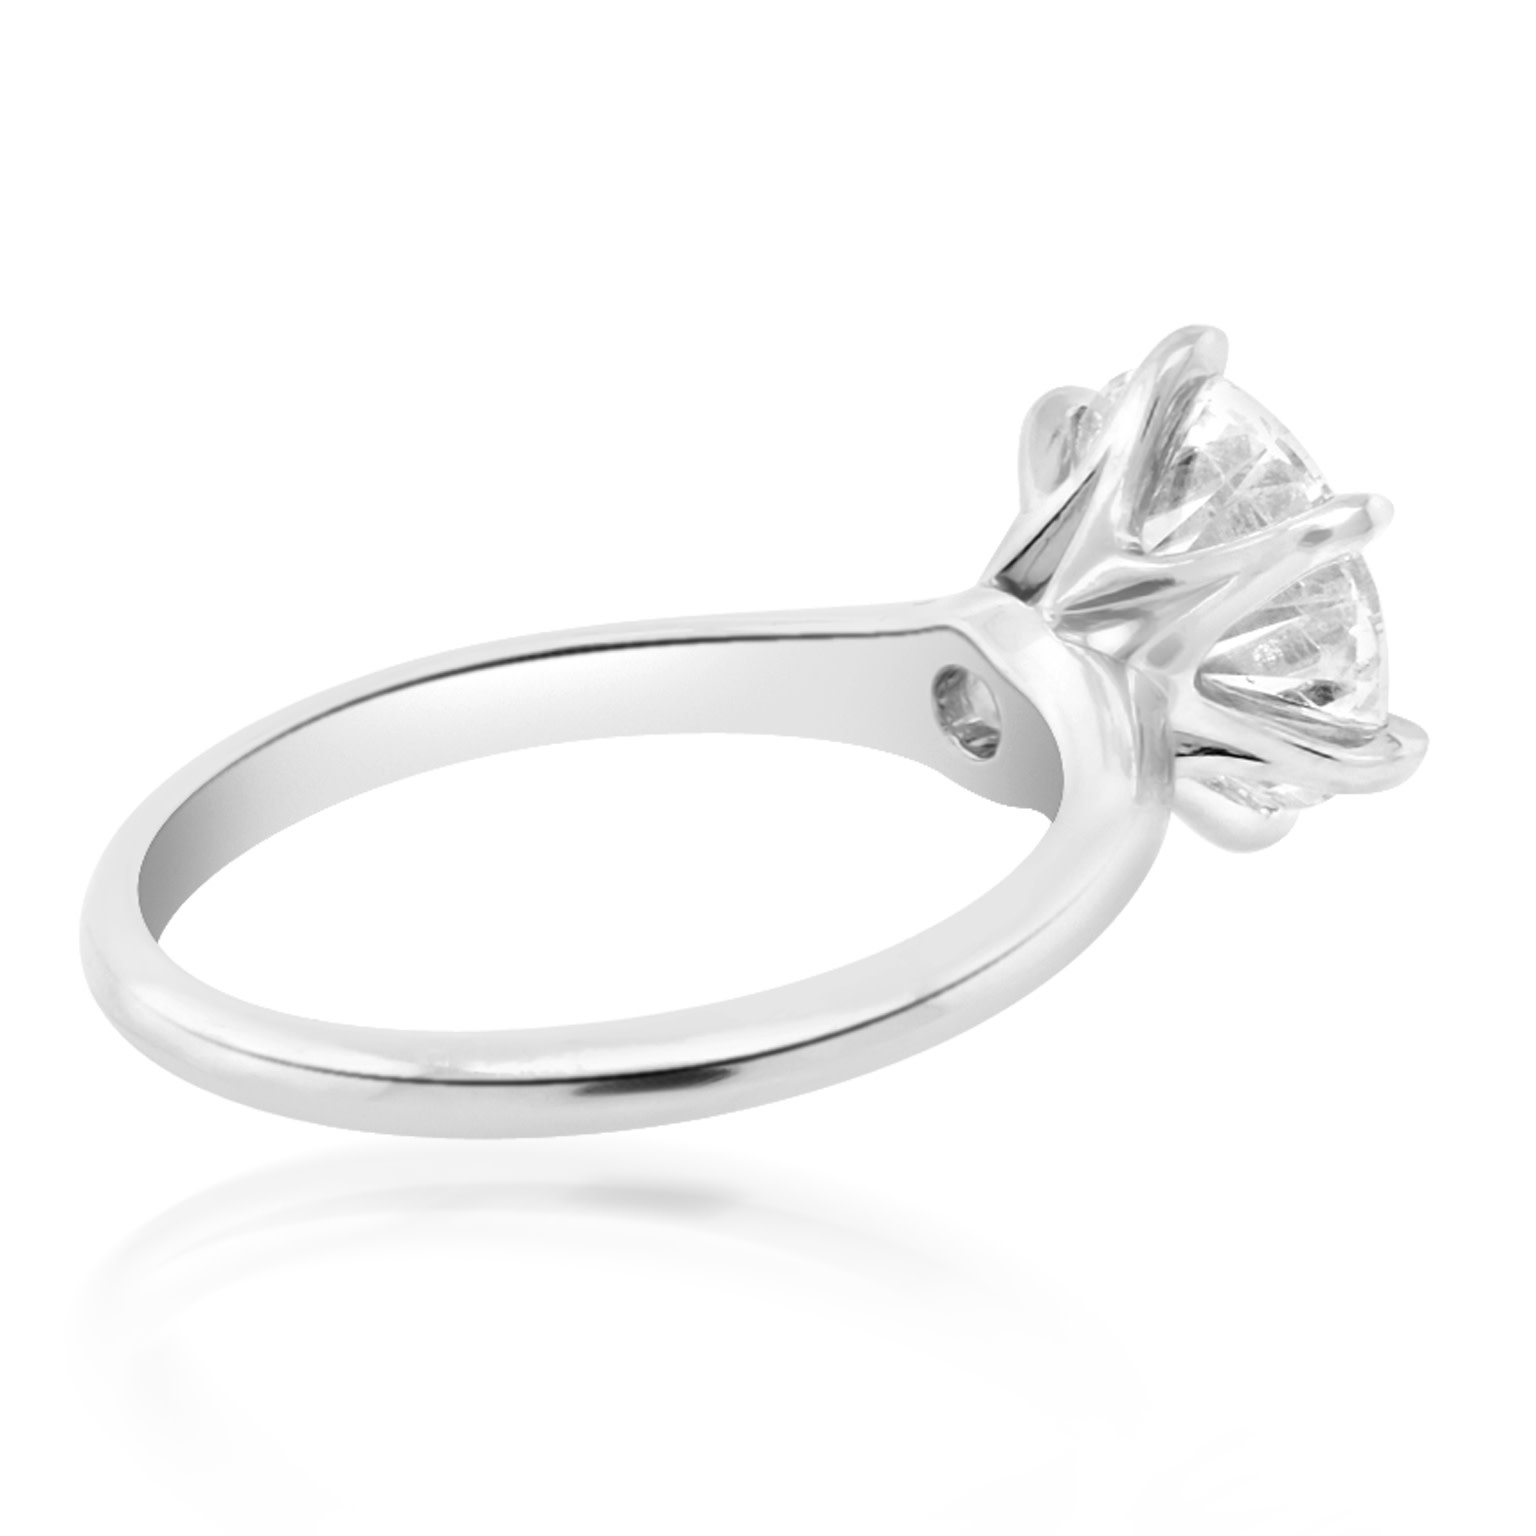 2.50ct FVS2 Round Brilliant Lab Diamond Ring V21